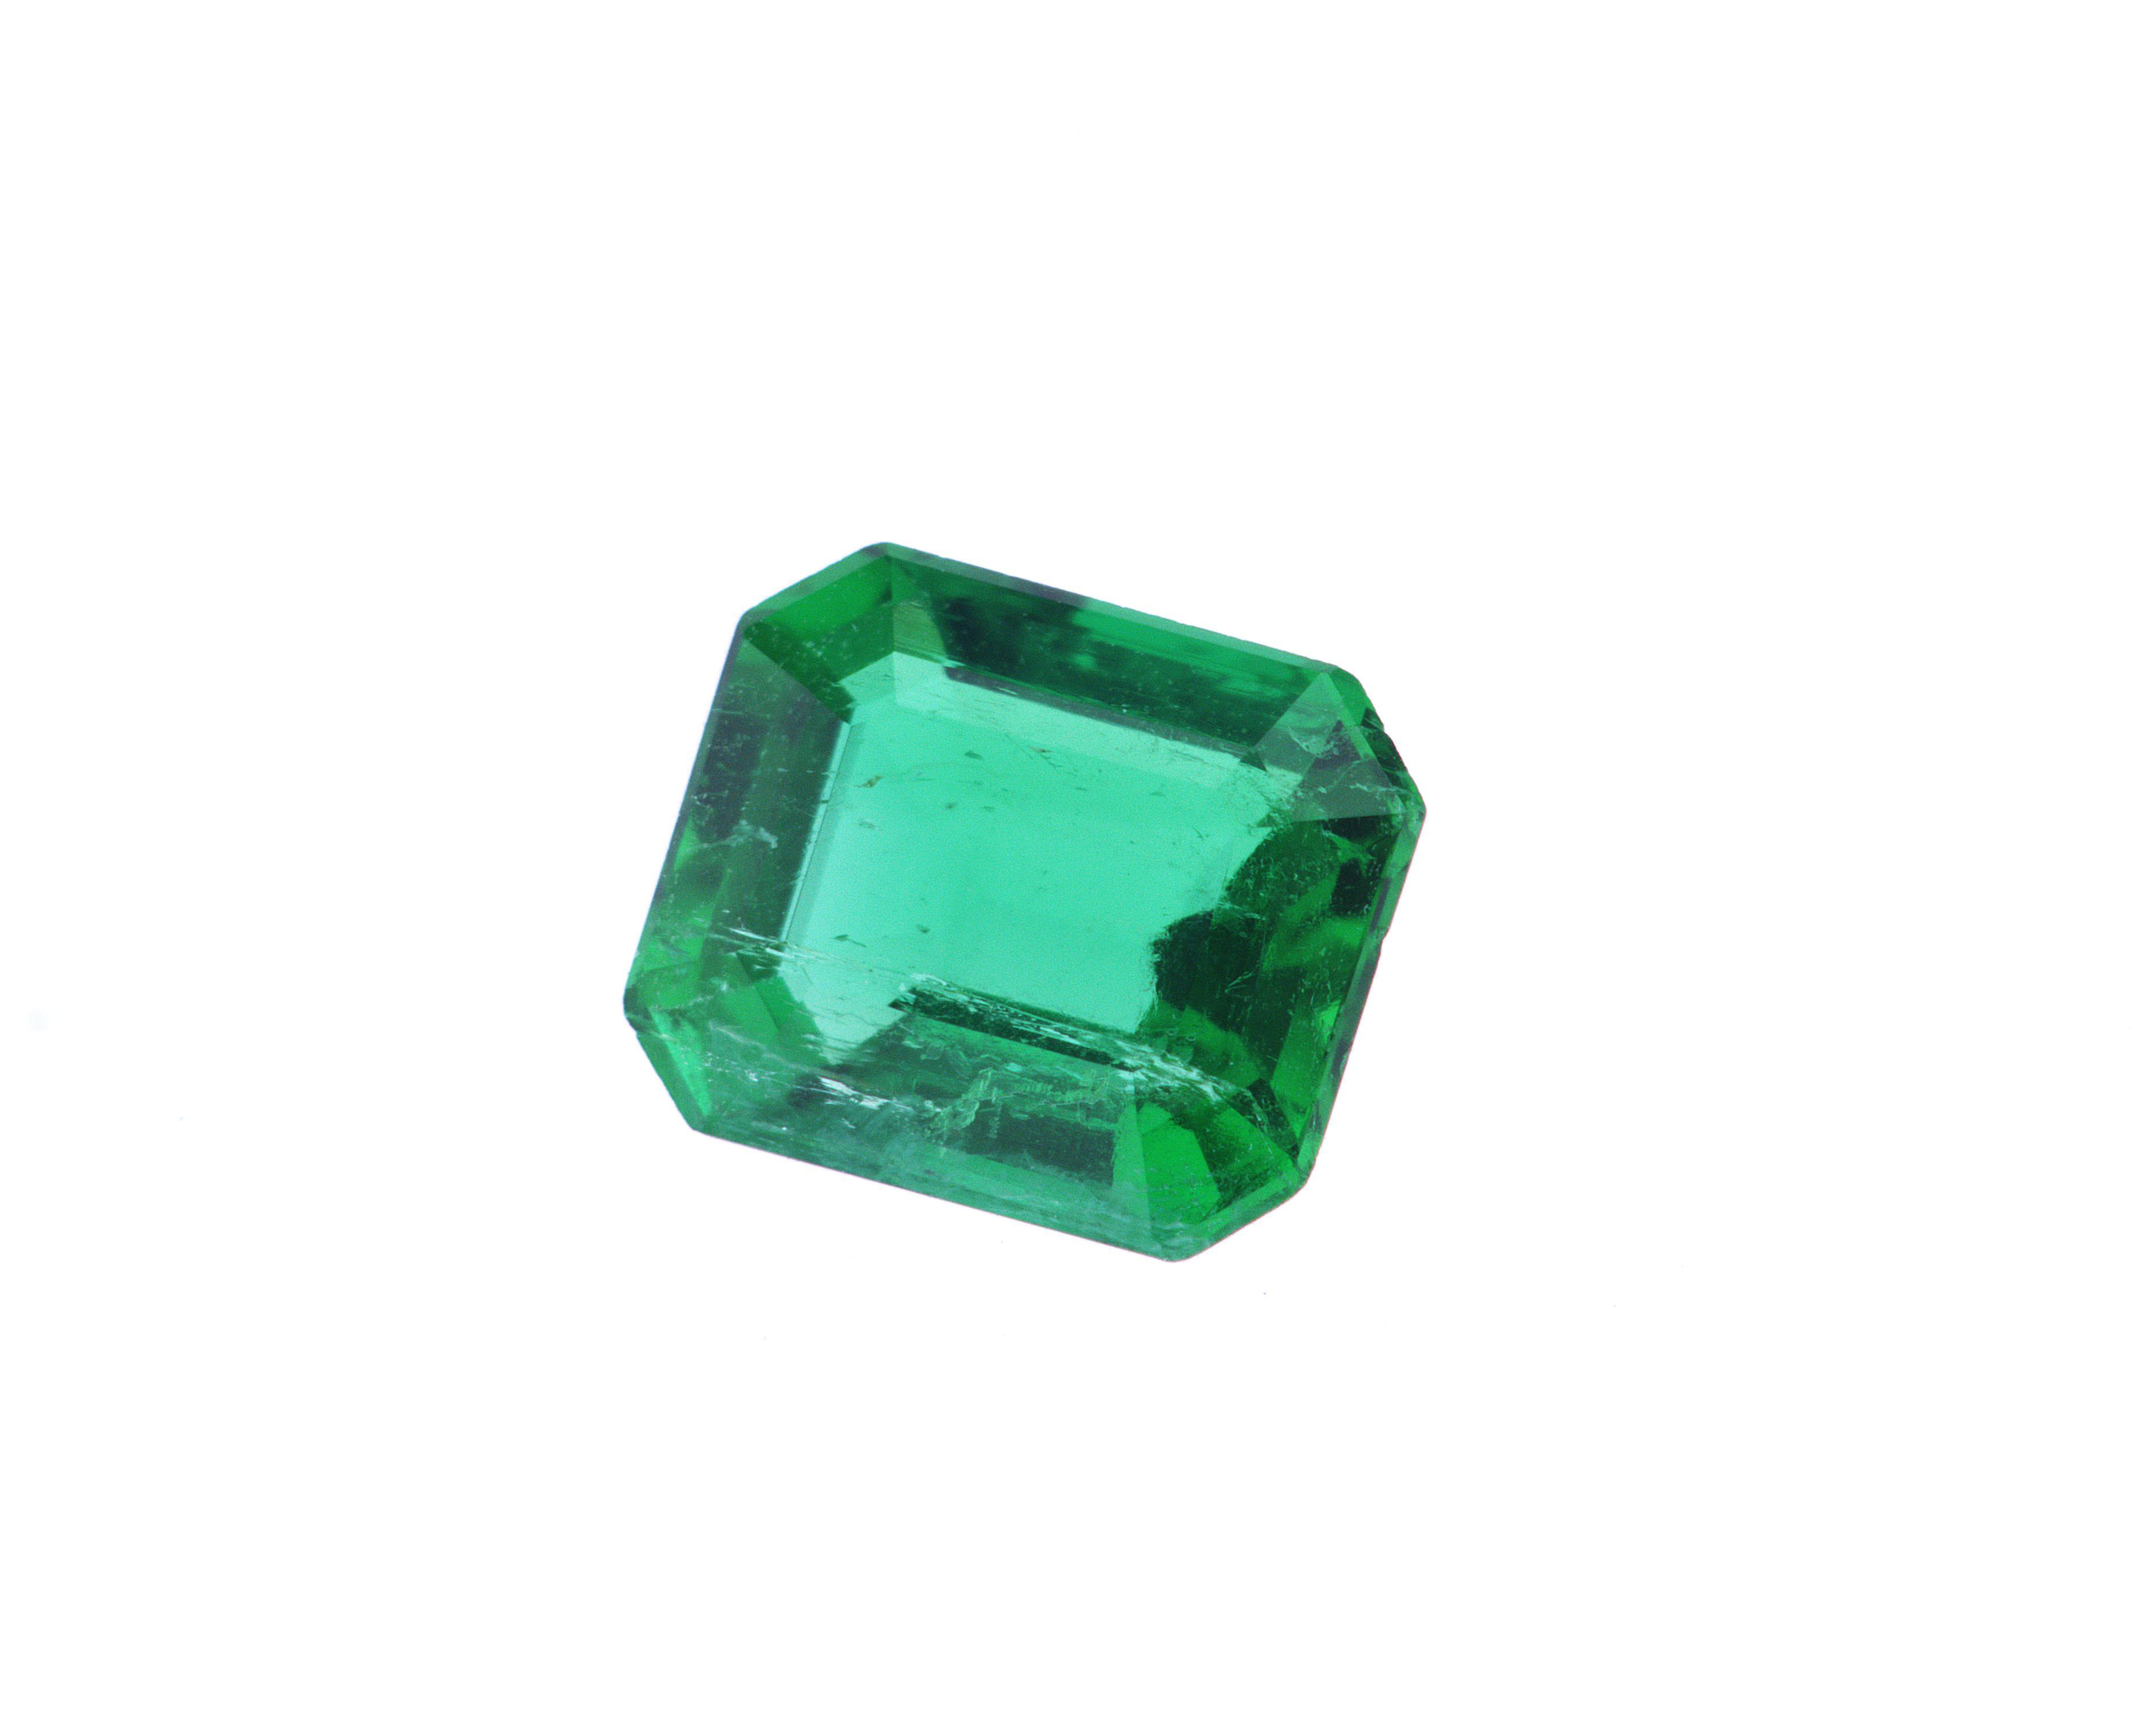 0.60 ct green octagon emerald